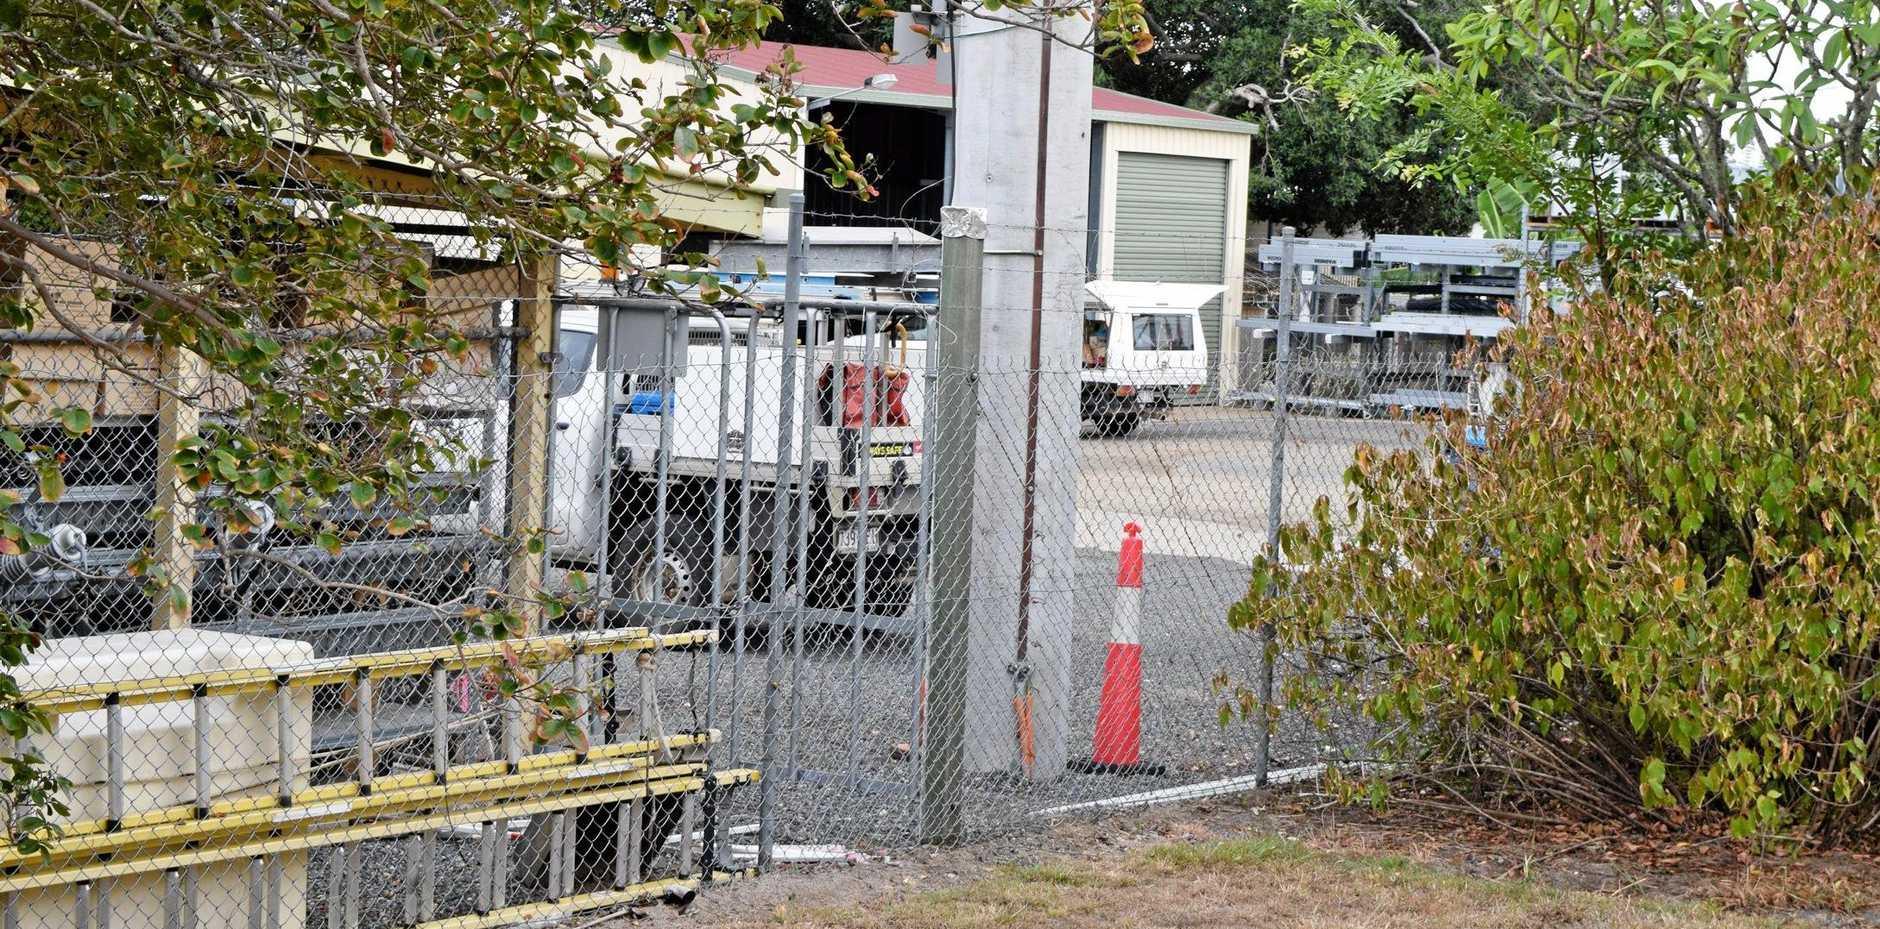 BREAK IN: Biggenden Ergon Energy depot has been broken into and a quantity of copper wire and tools stolen.